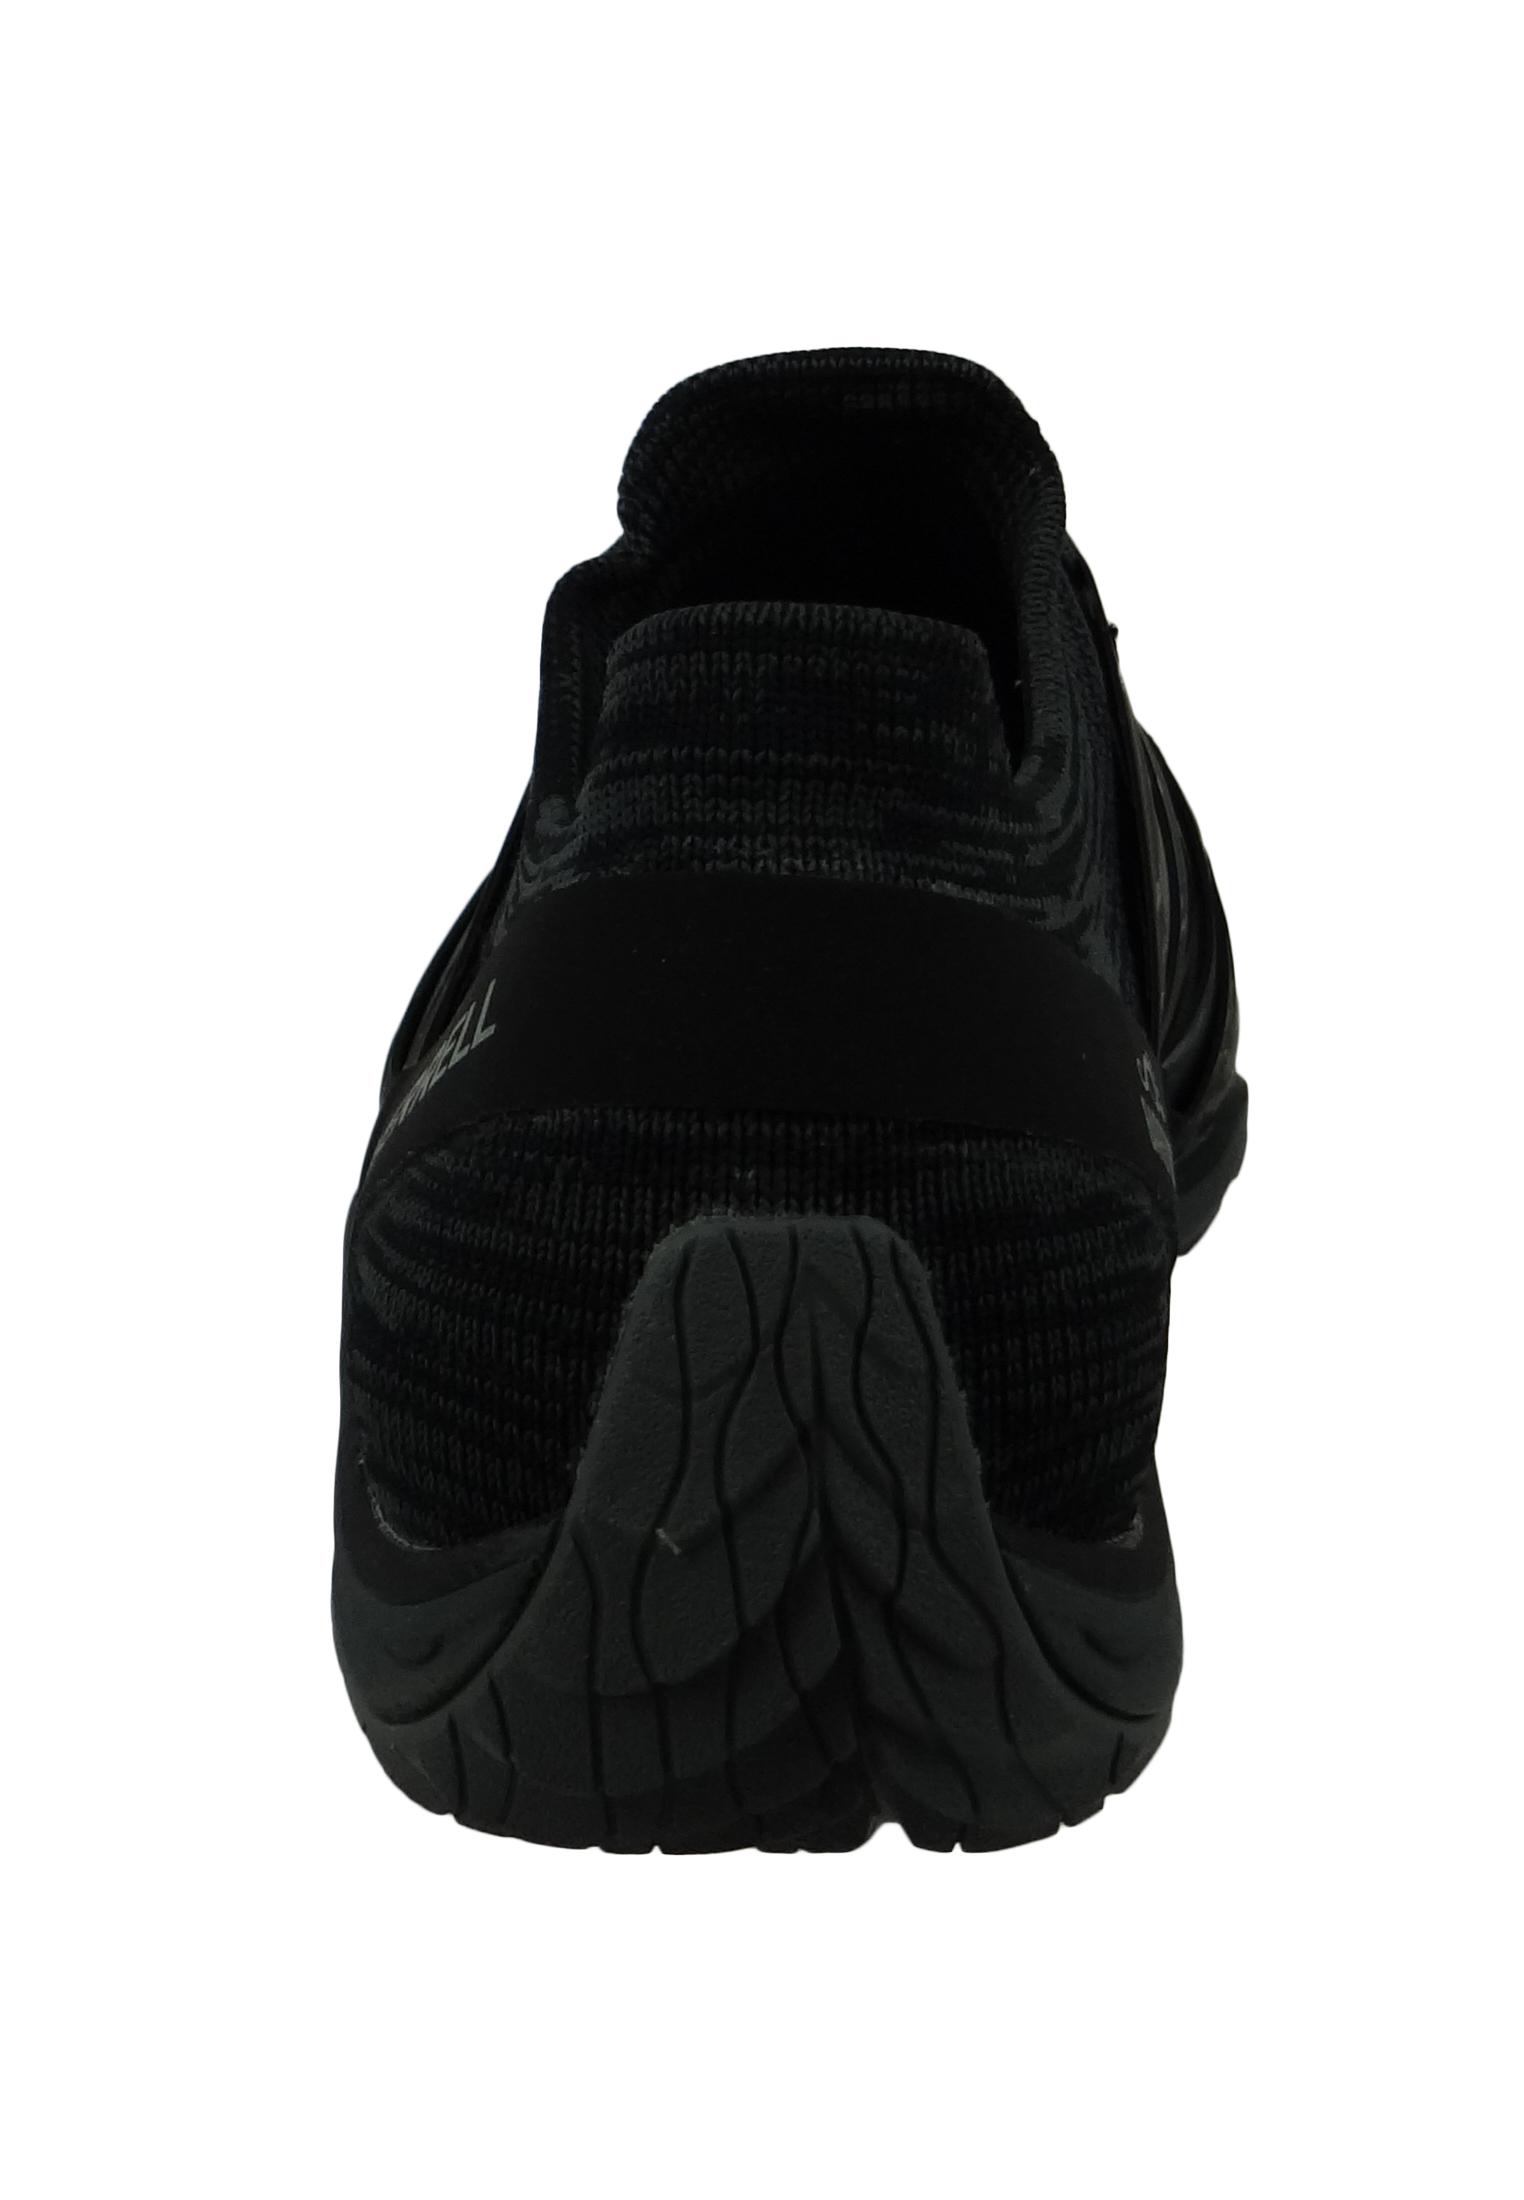 Merrell Trail Glove 5 3D J48885 Herren Black Schwarz Trail Running Barefoot Run